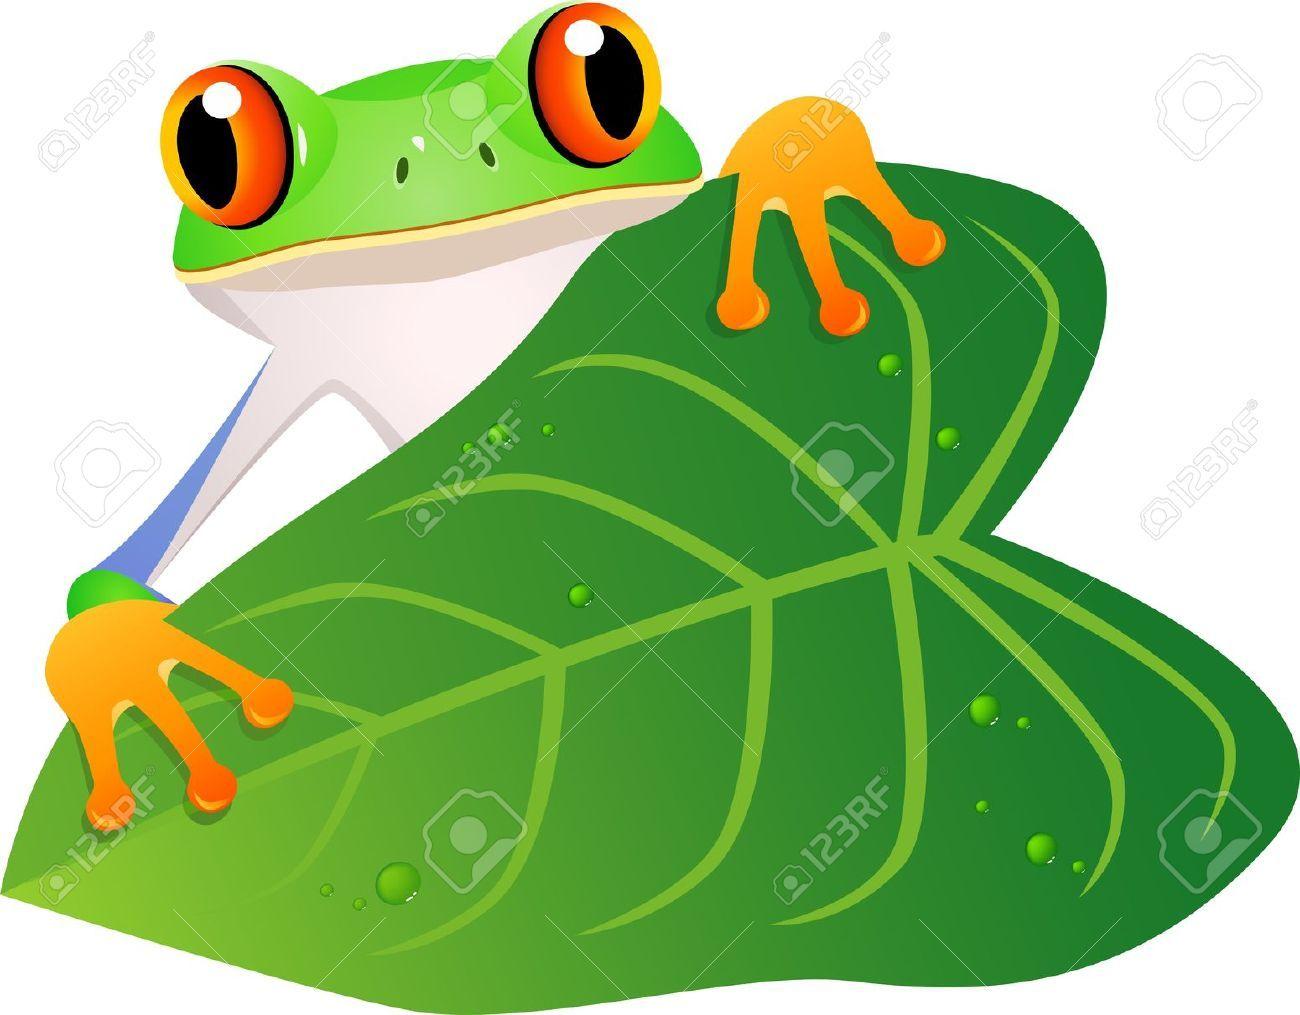 Frog peeking clipart vector Peek Stock Vector Illustration And Royalty Free Peek Clipart   FROG ... vector